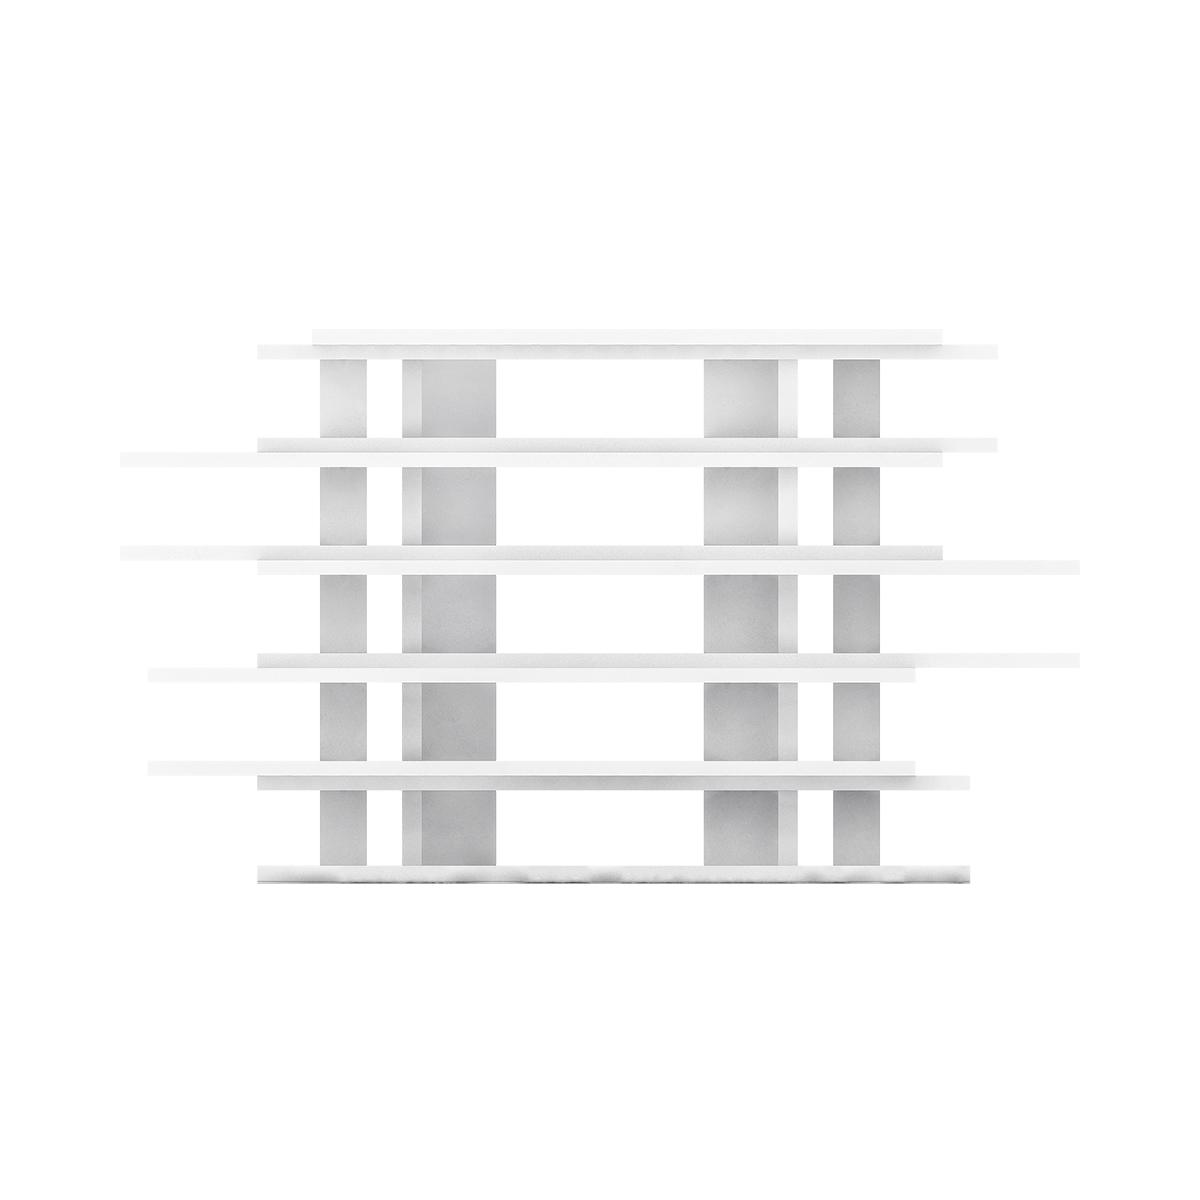 PDF_plates_02.jpg